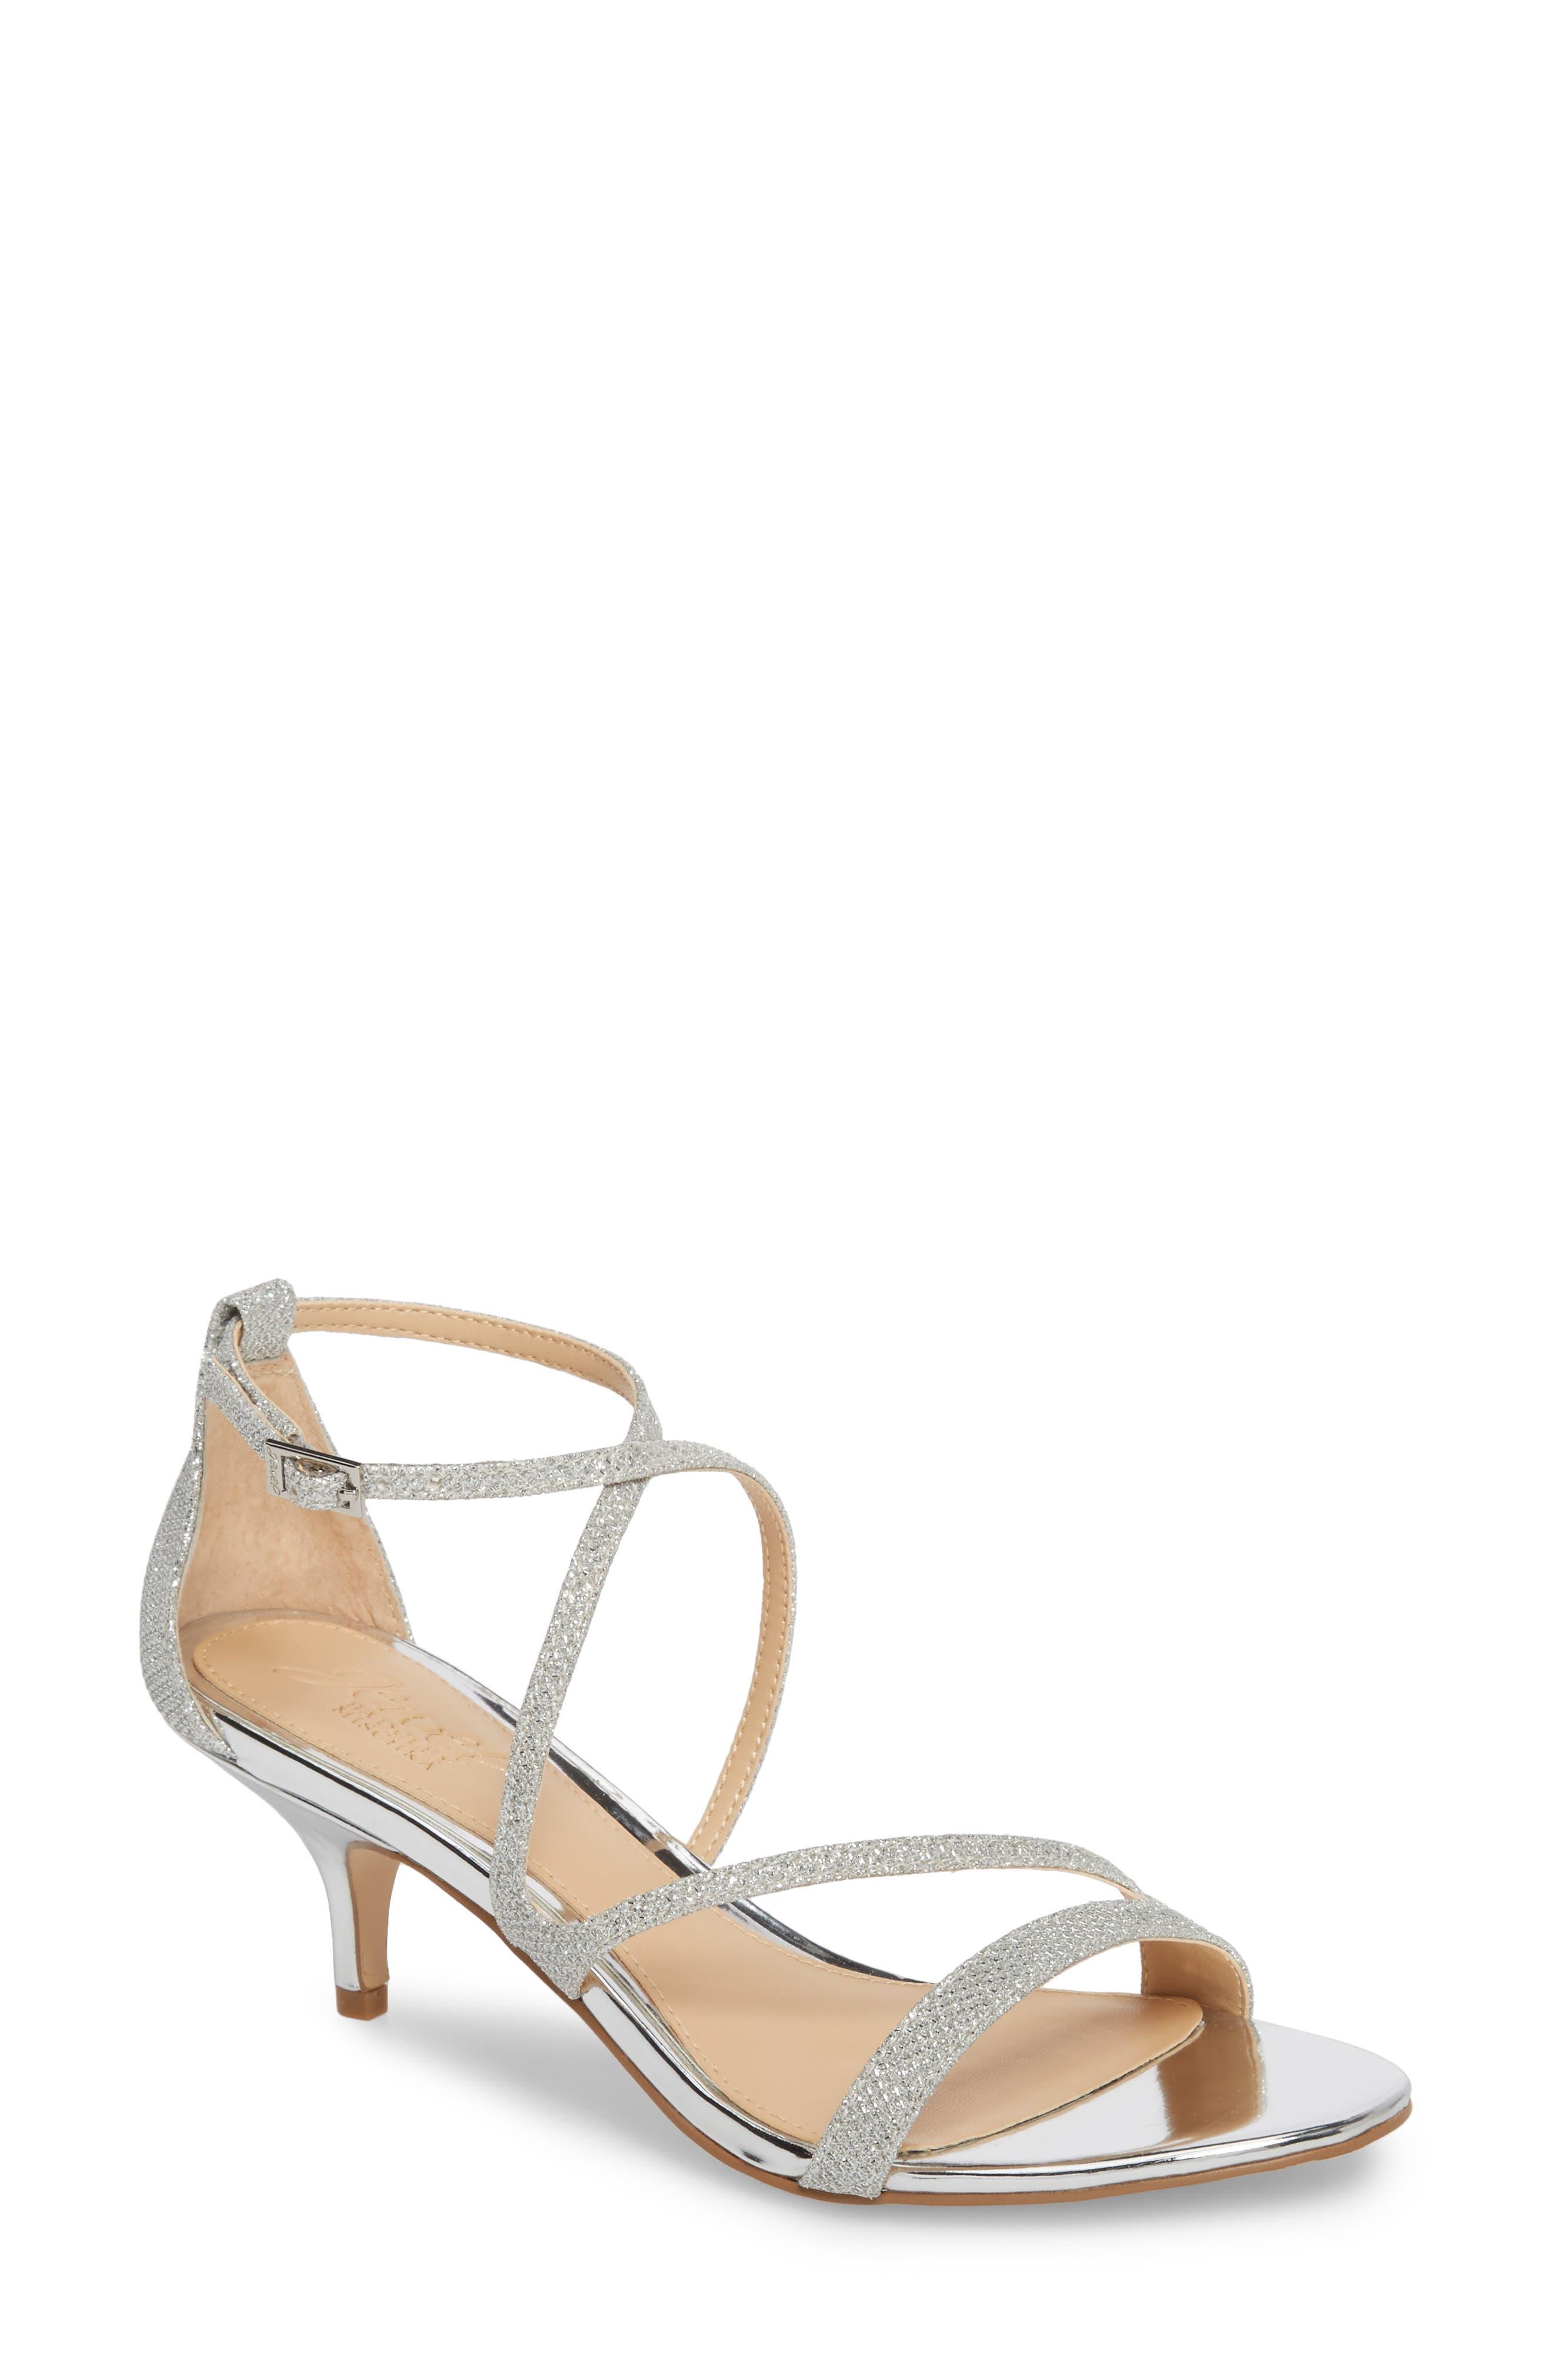 Jewel Badgley Mischka Gal Glitter Kitten Heel Sandal